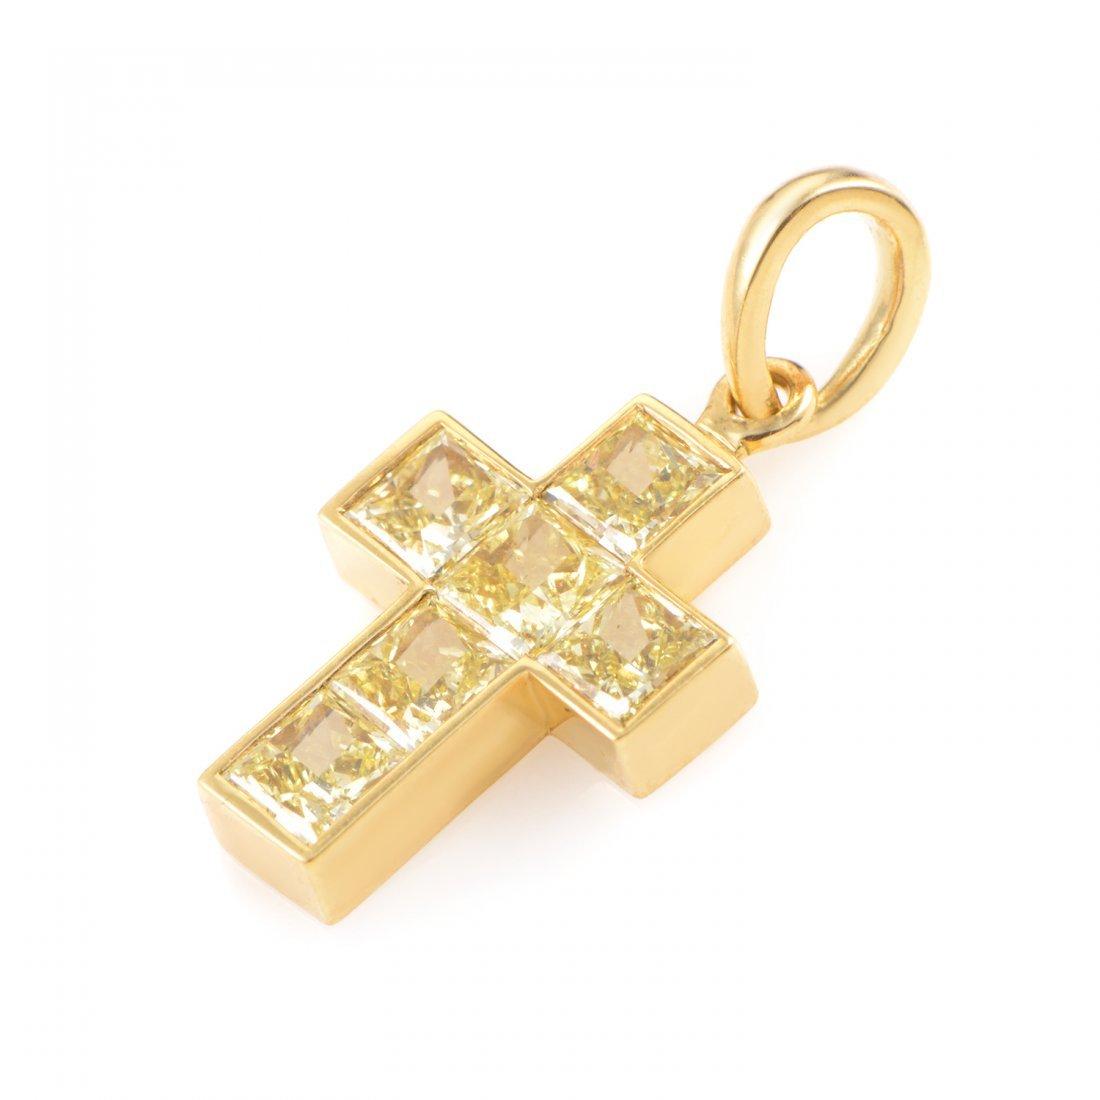 Cartier 18K Yellow Gold Fancy Yellow Diamond Cross - 2